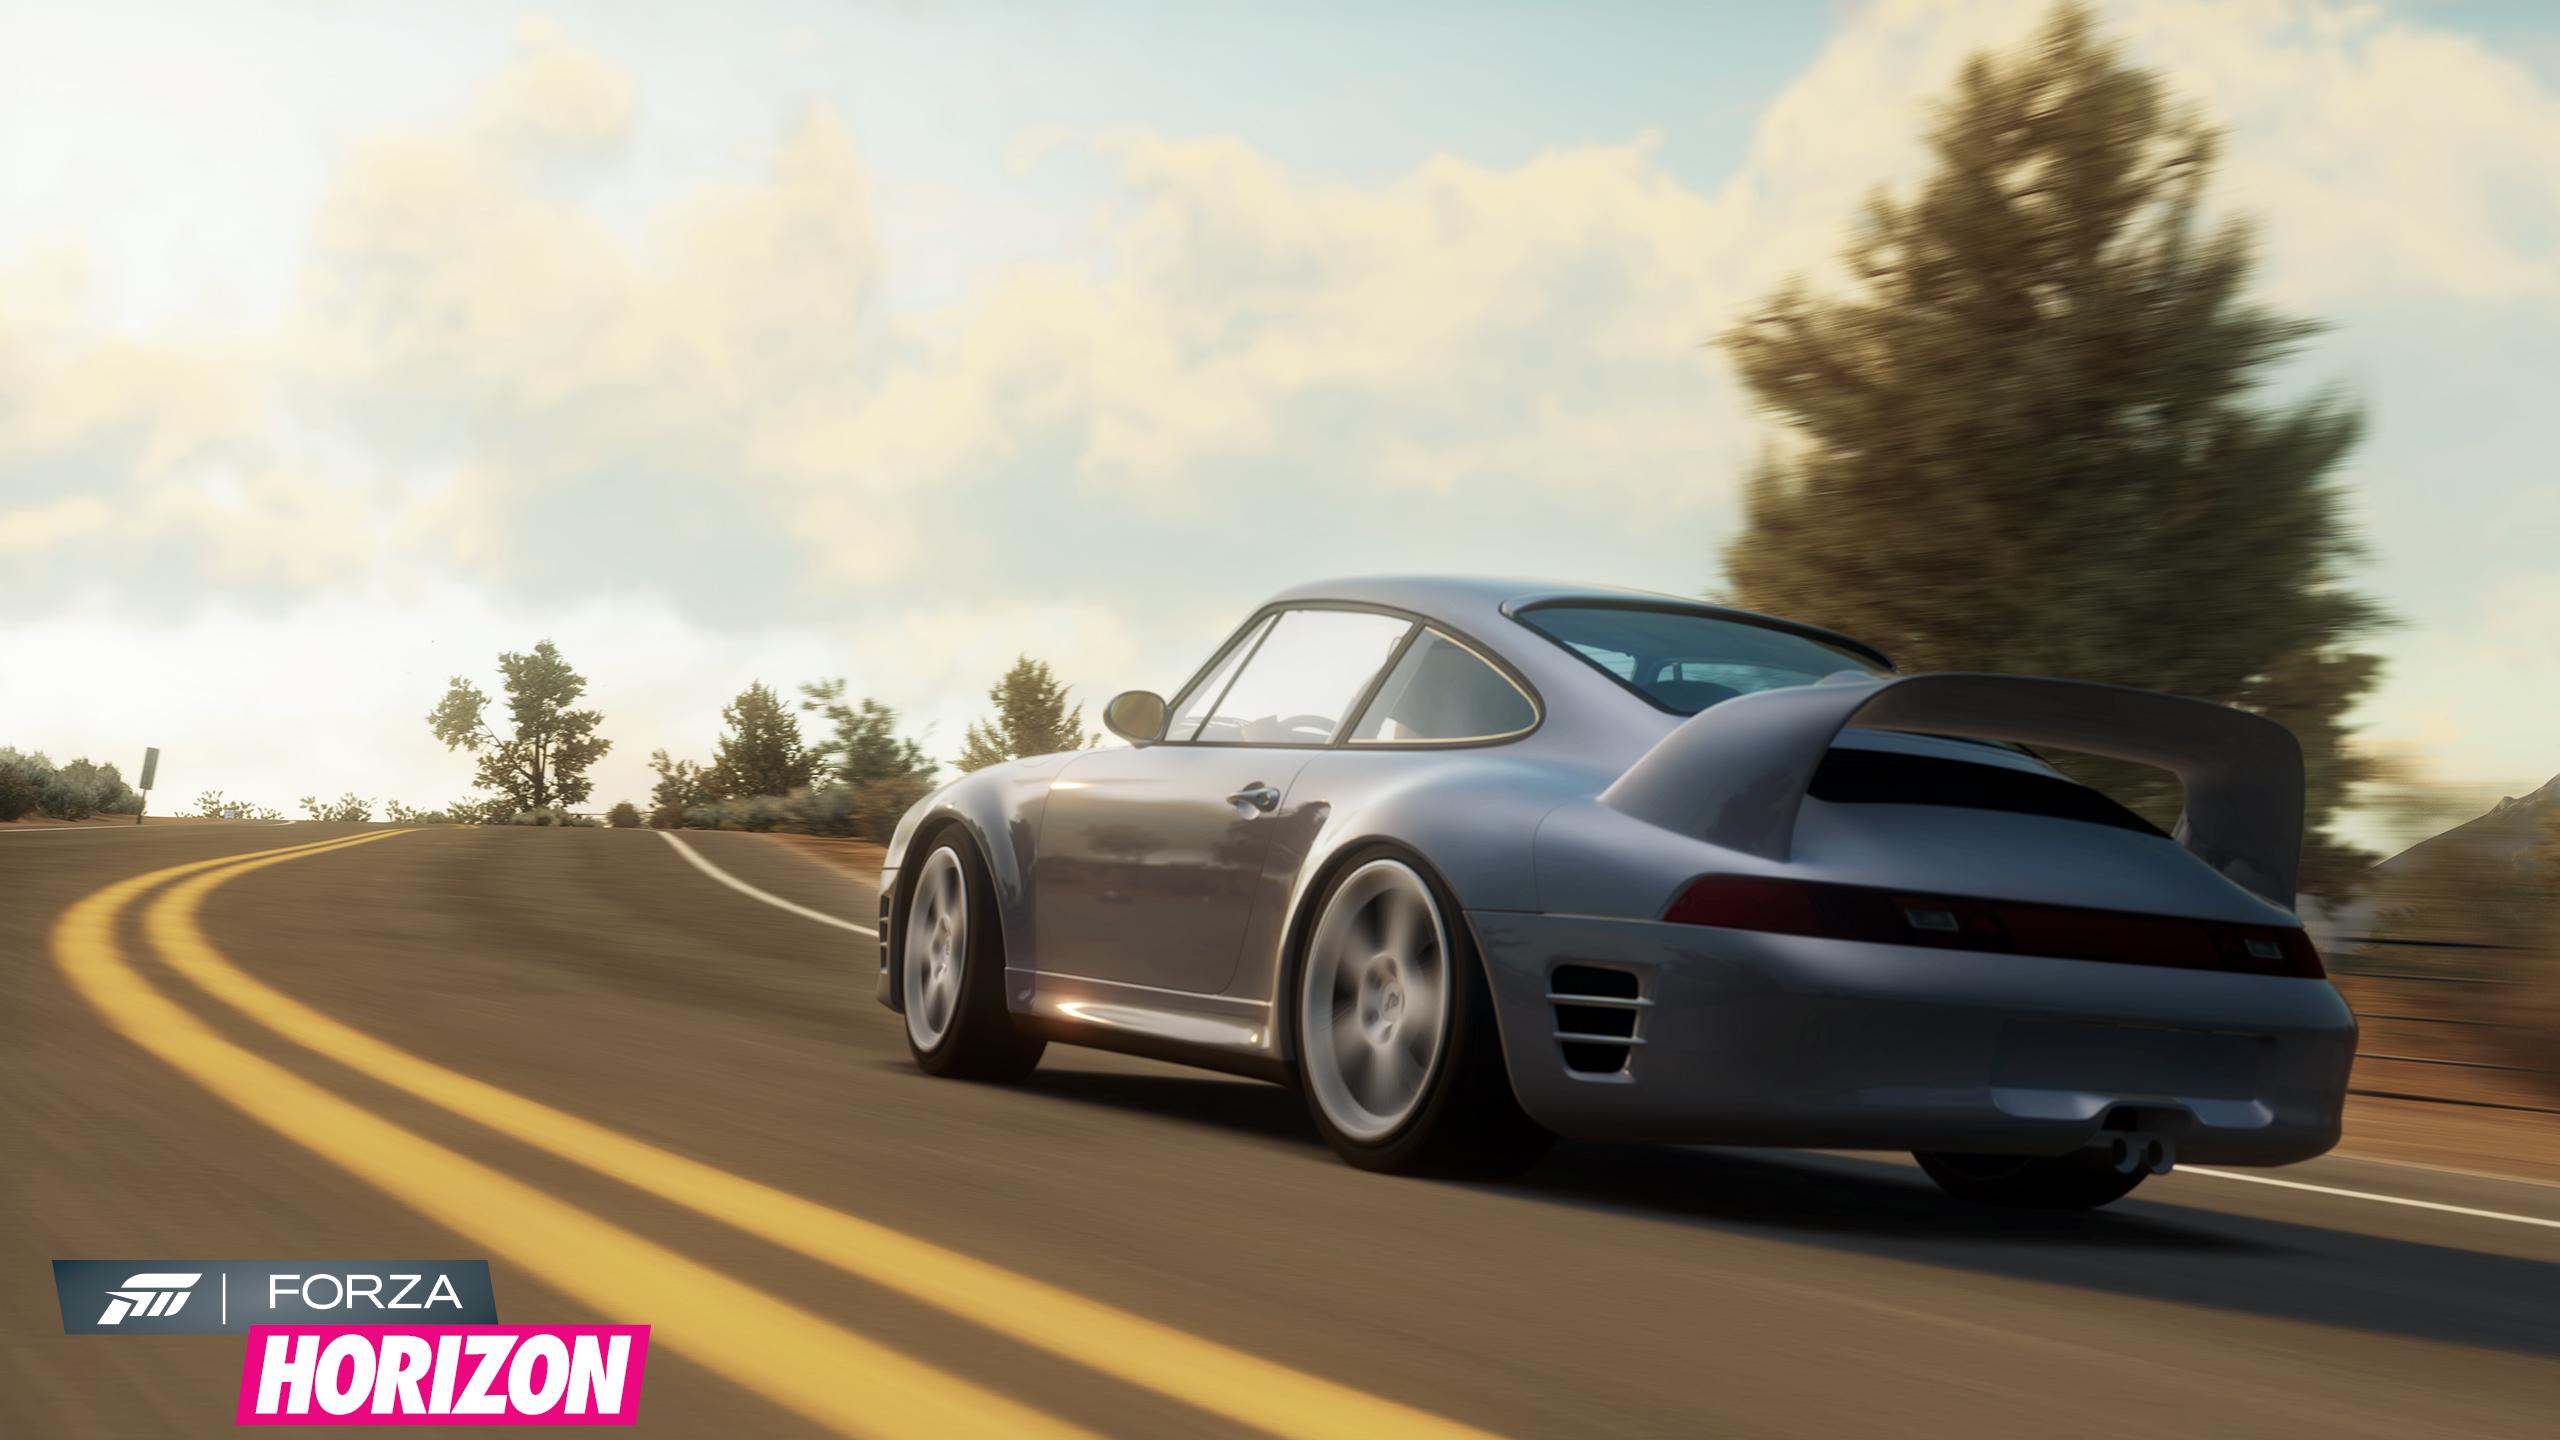 Forza Horizon(Exclusivo pra Xbox) Forza-horizon-fica-maior-do-que-nunca-com-o-1000-club